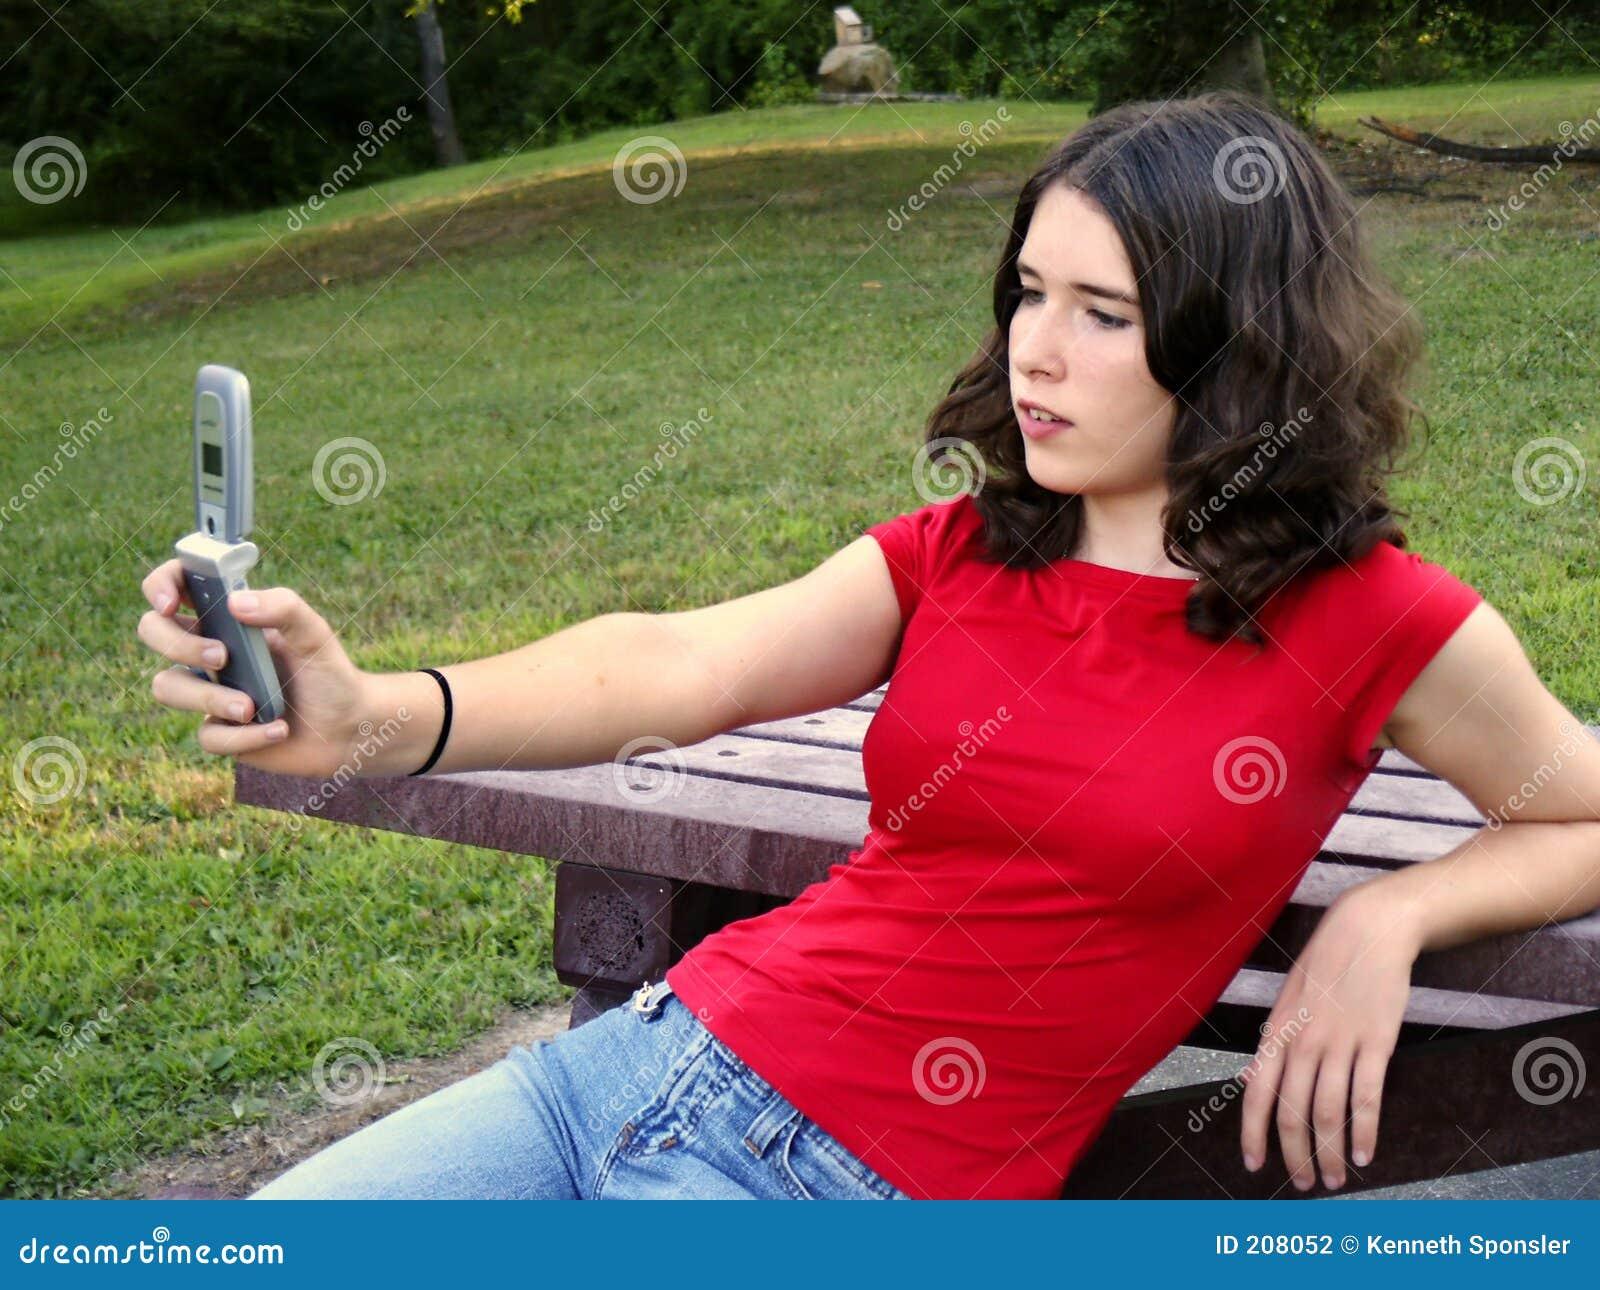 Camera Phone Teen 29